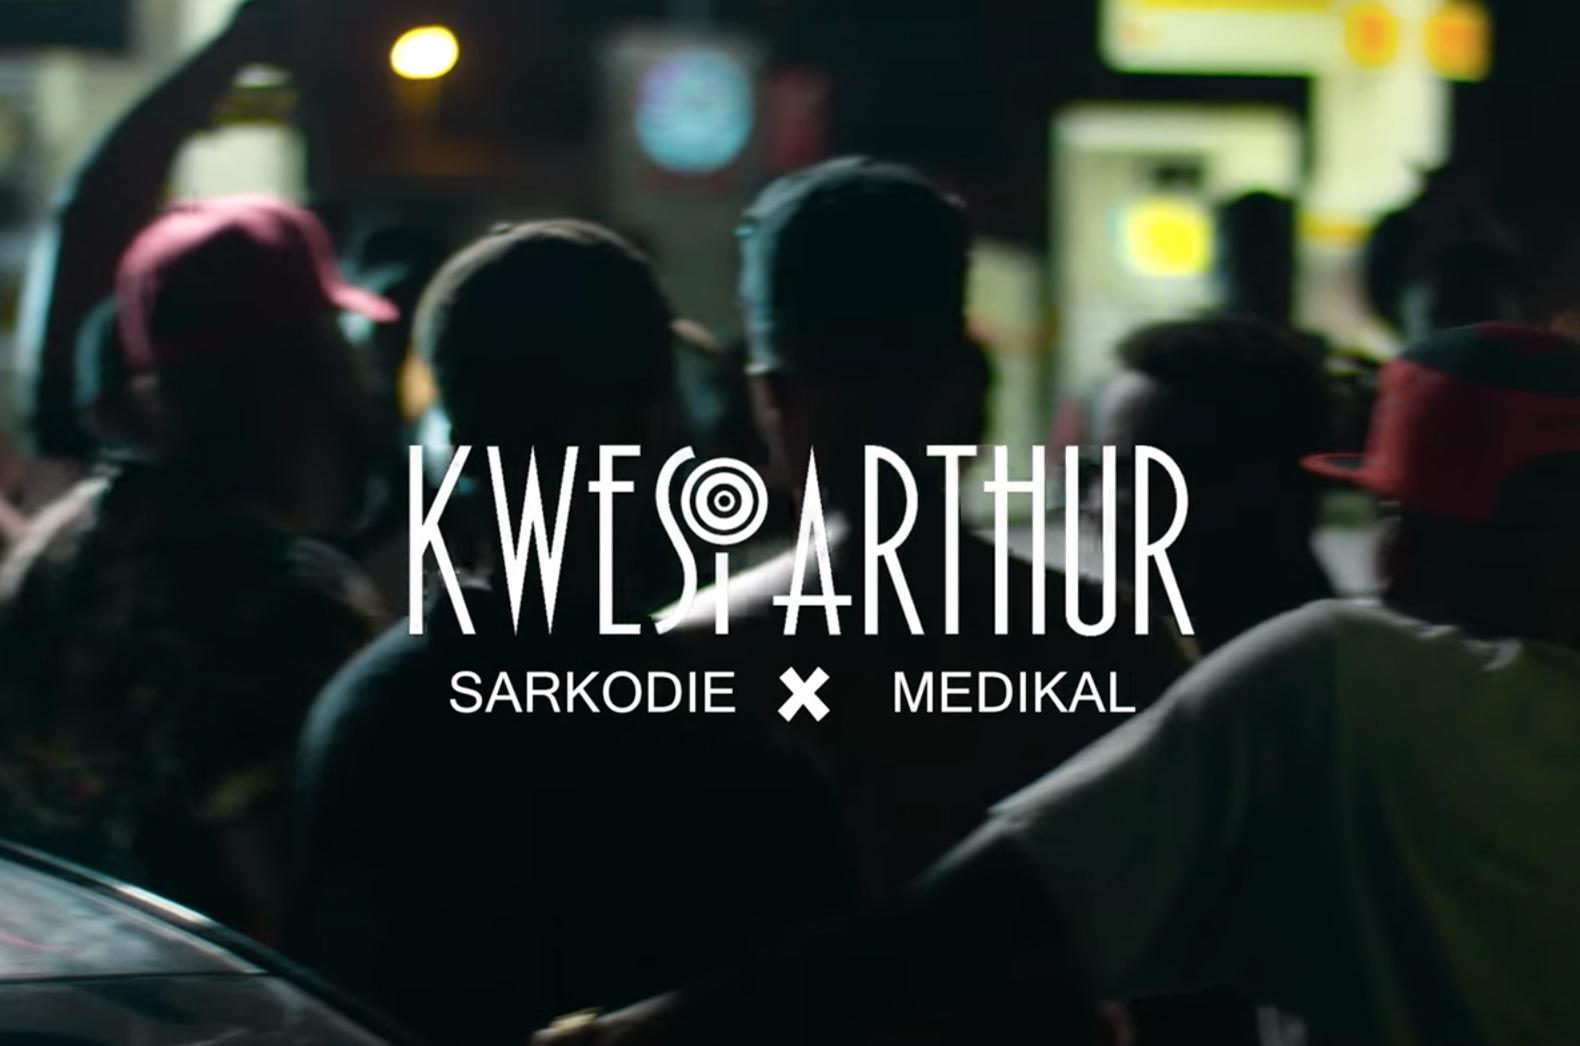 kwesi arthur, ghana music, sarkodie, medikal, grind day remix